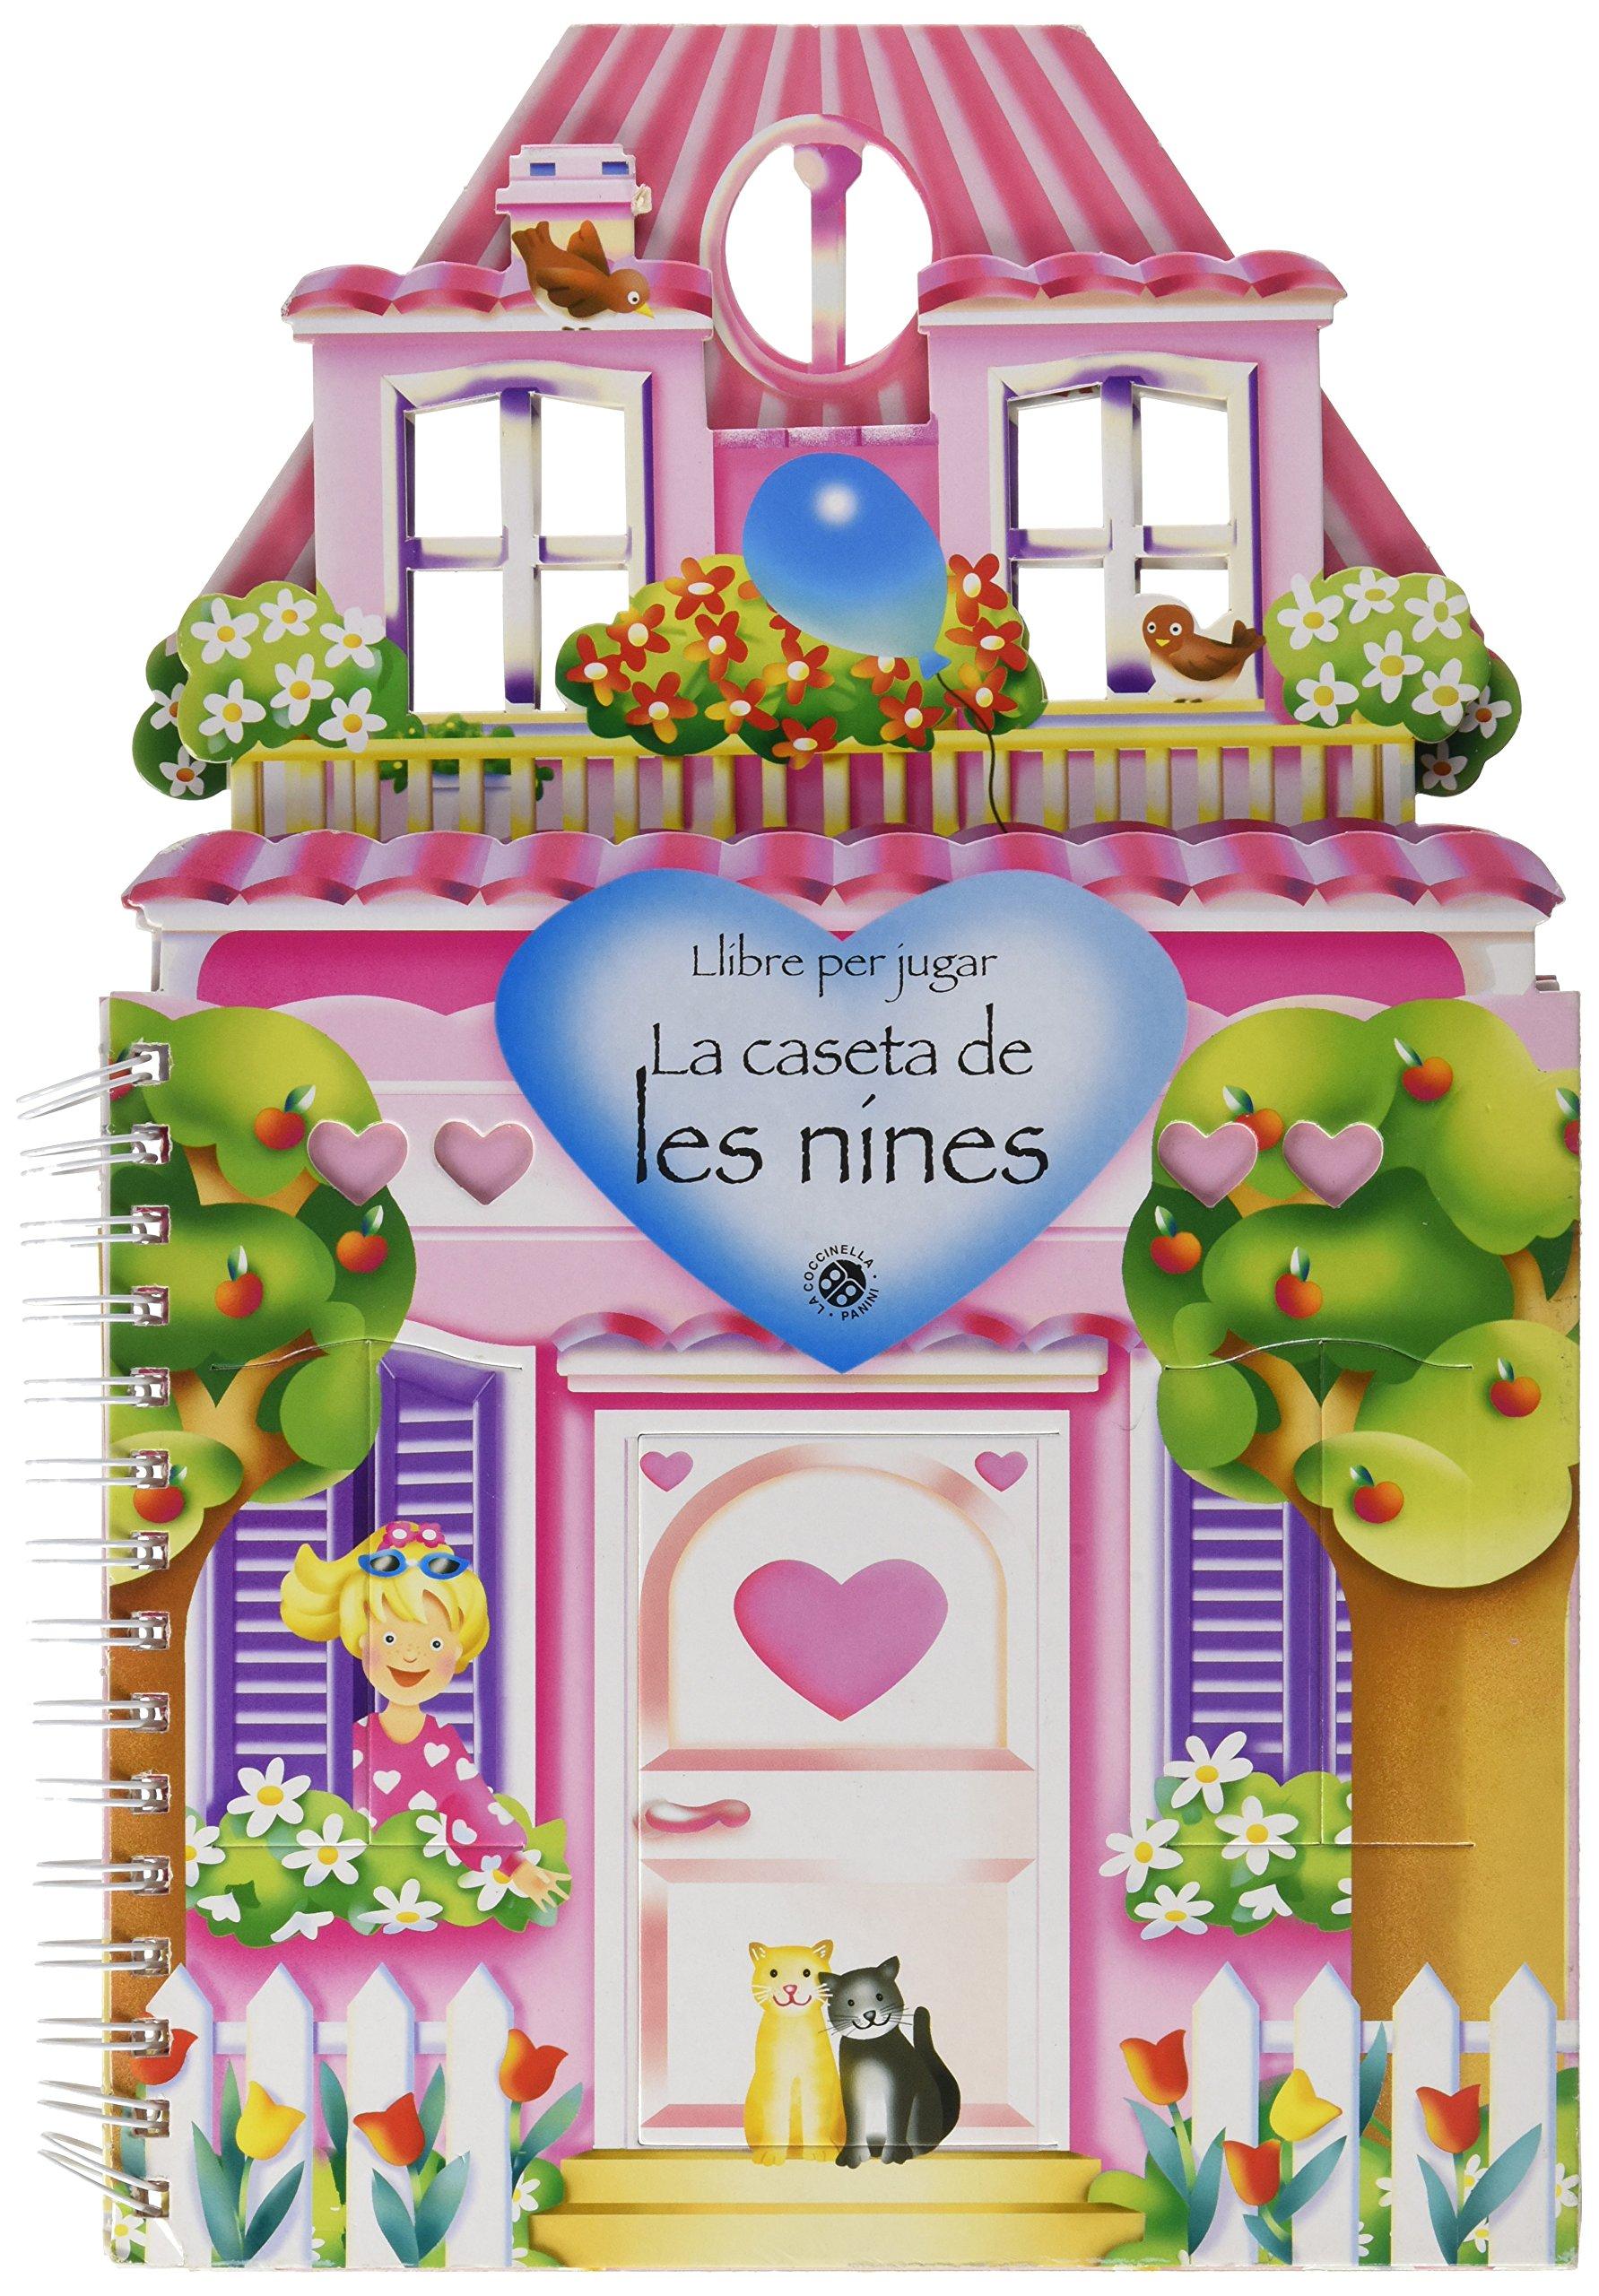 La caseta de les nines Libro para jugar: Amazon.es: Elena Gornati, PANINI ESPAÑA: Libros